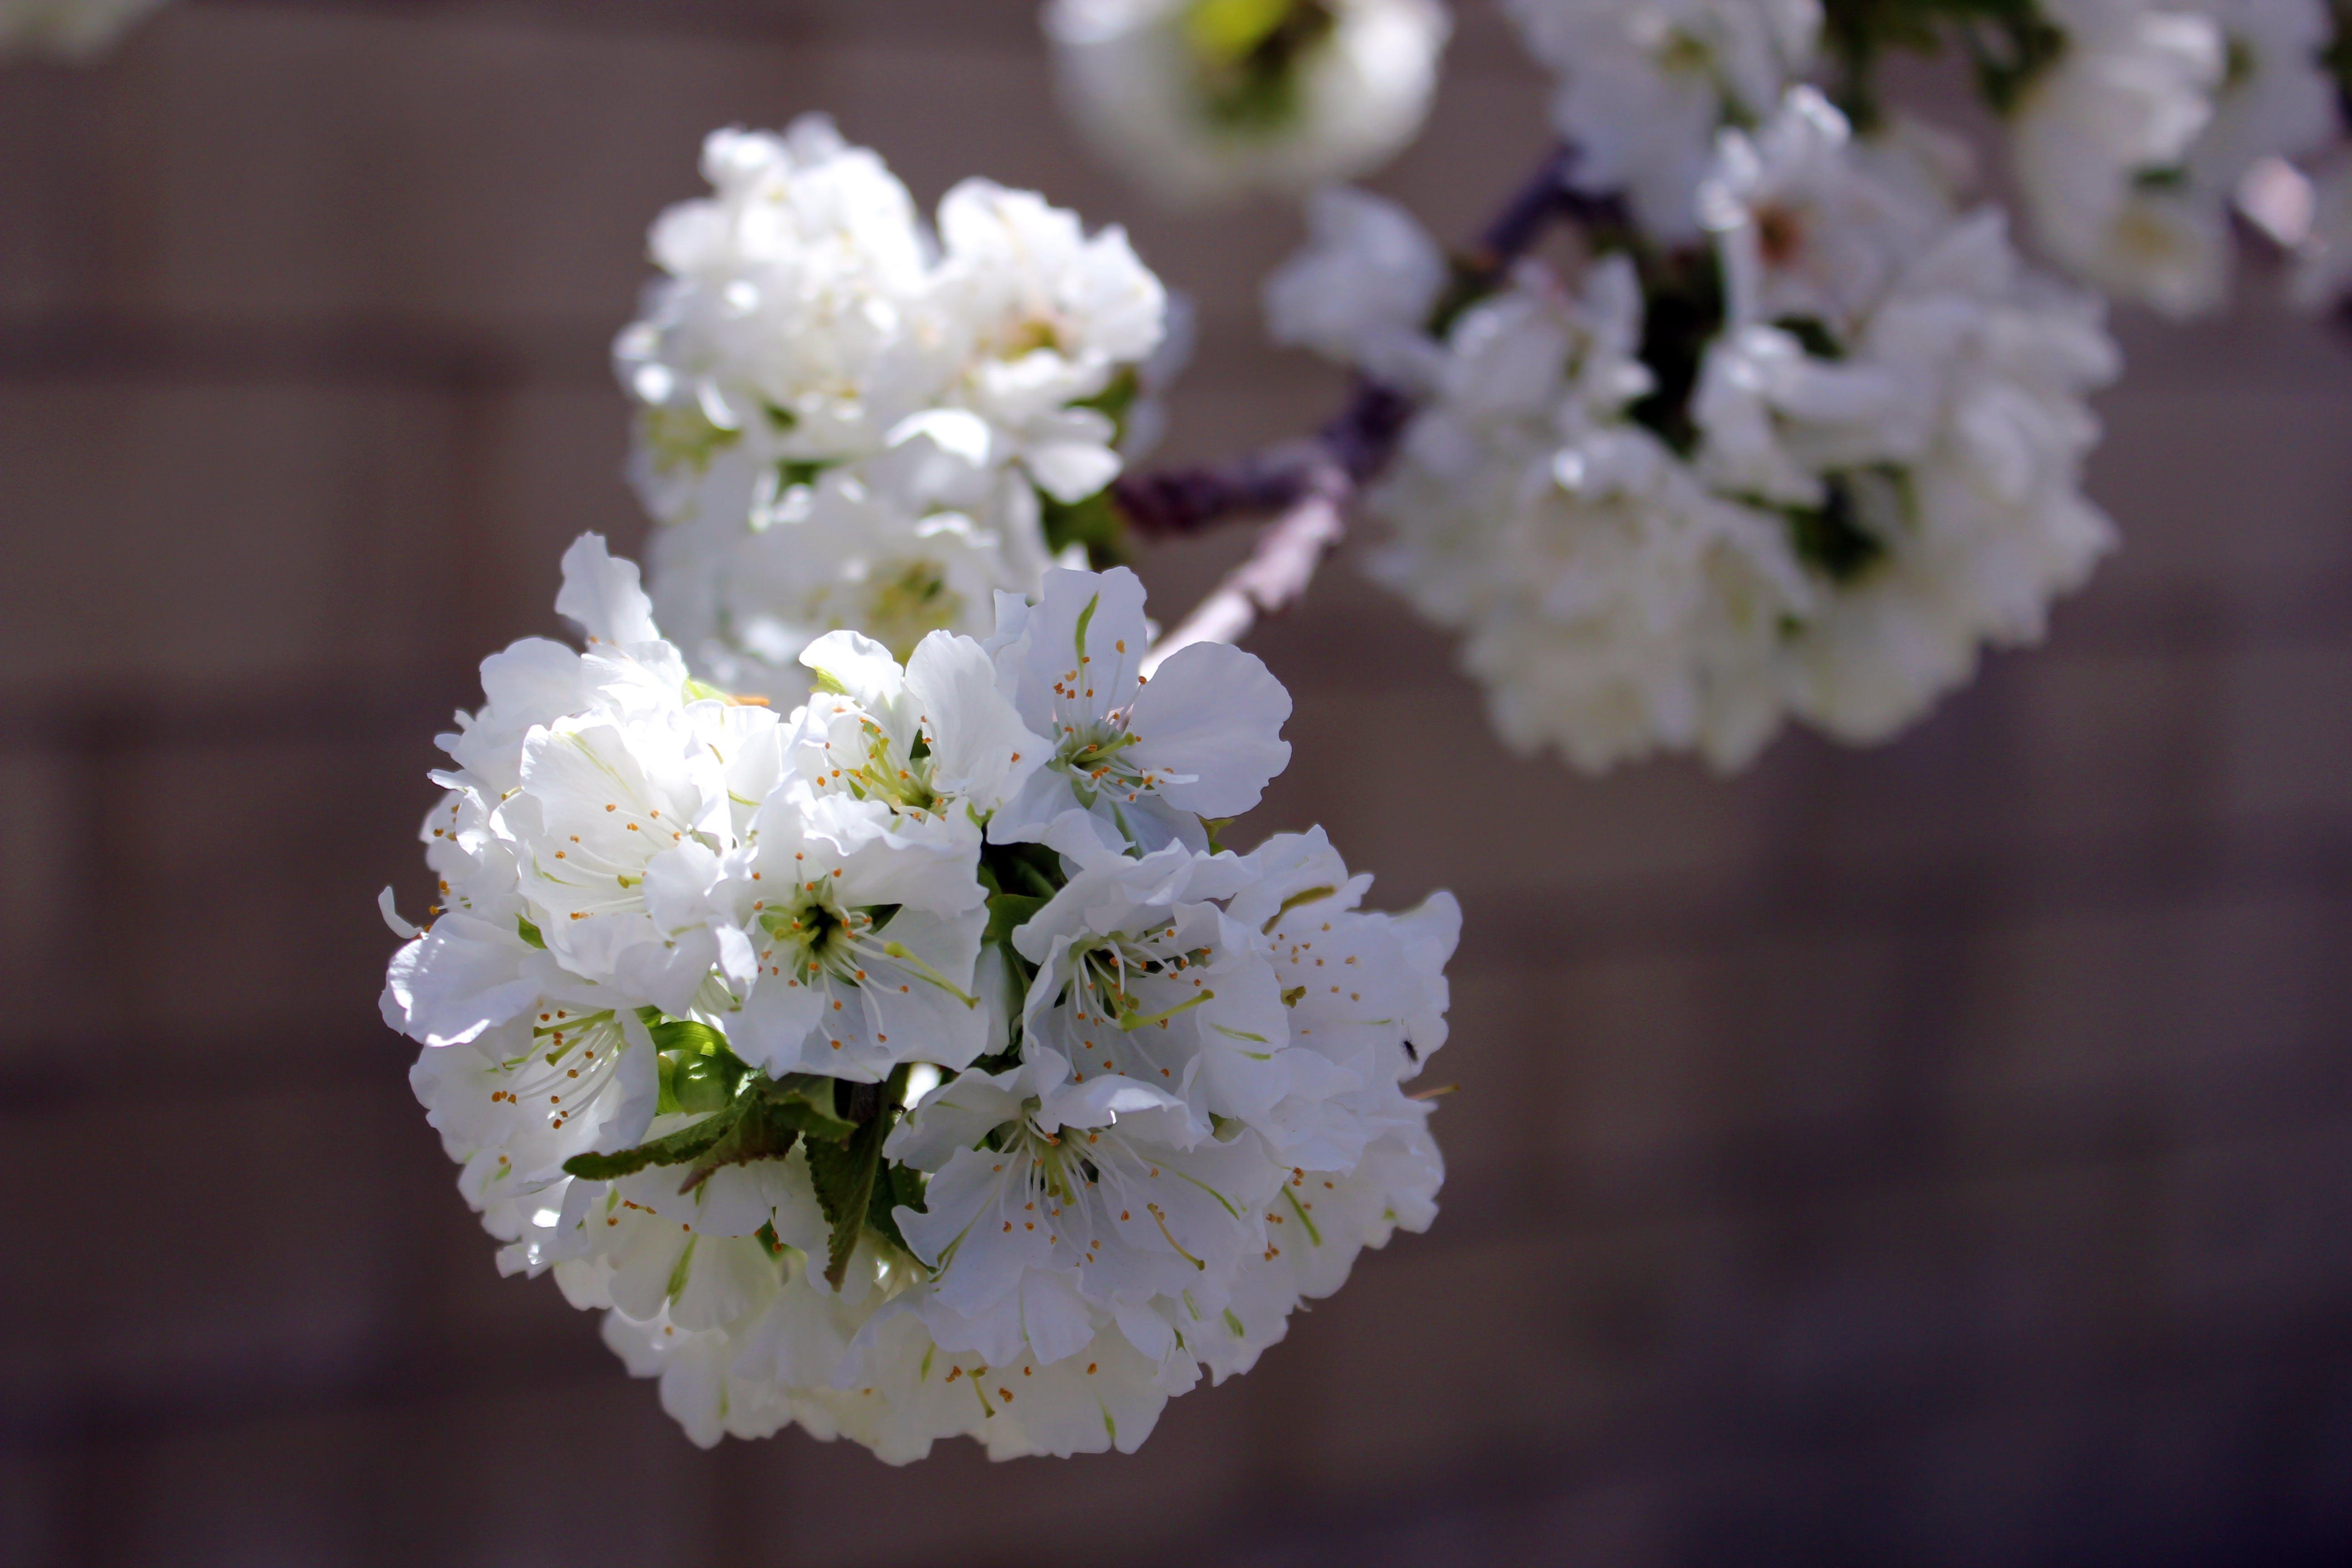 Free stock photo of cherry blossom, white blossom, white flower